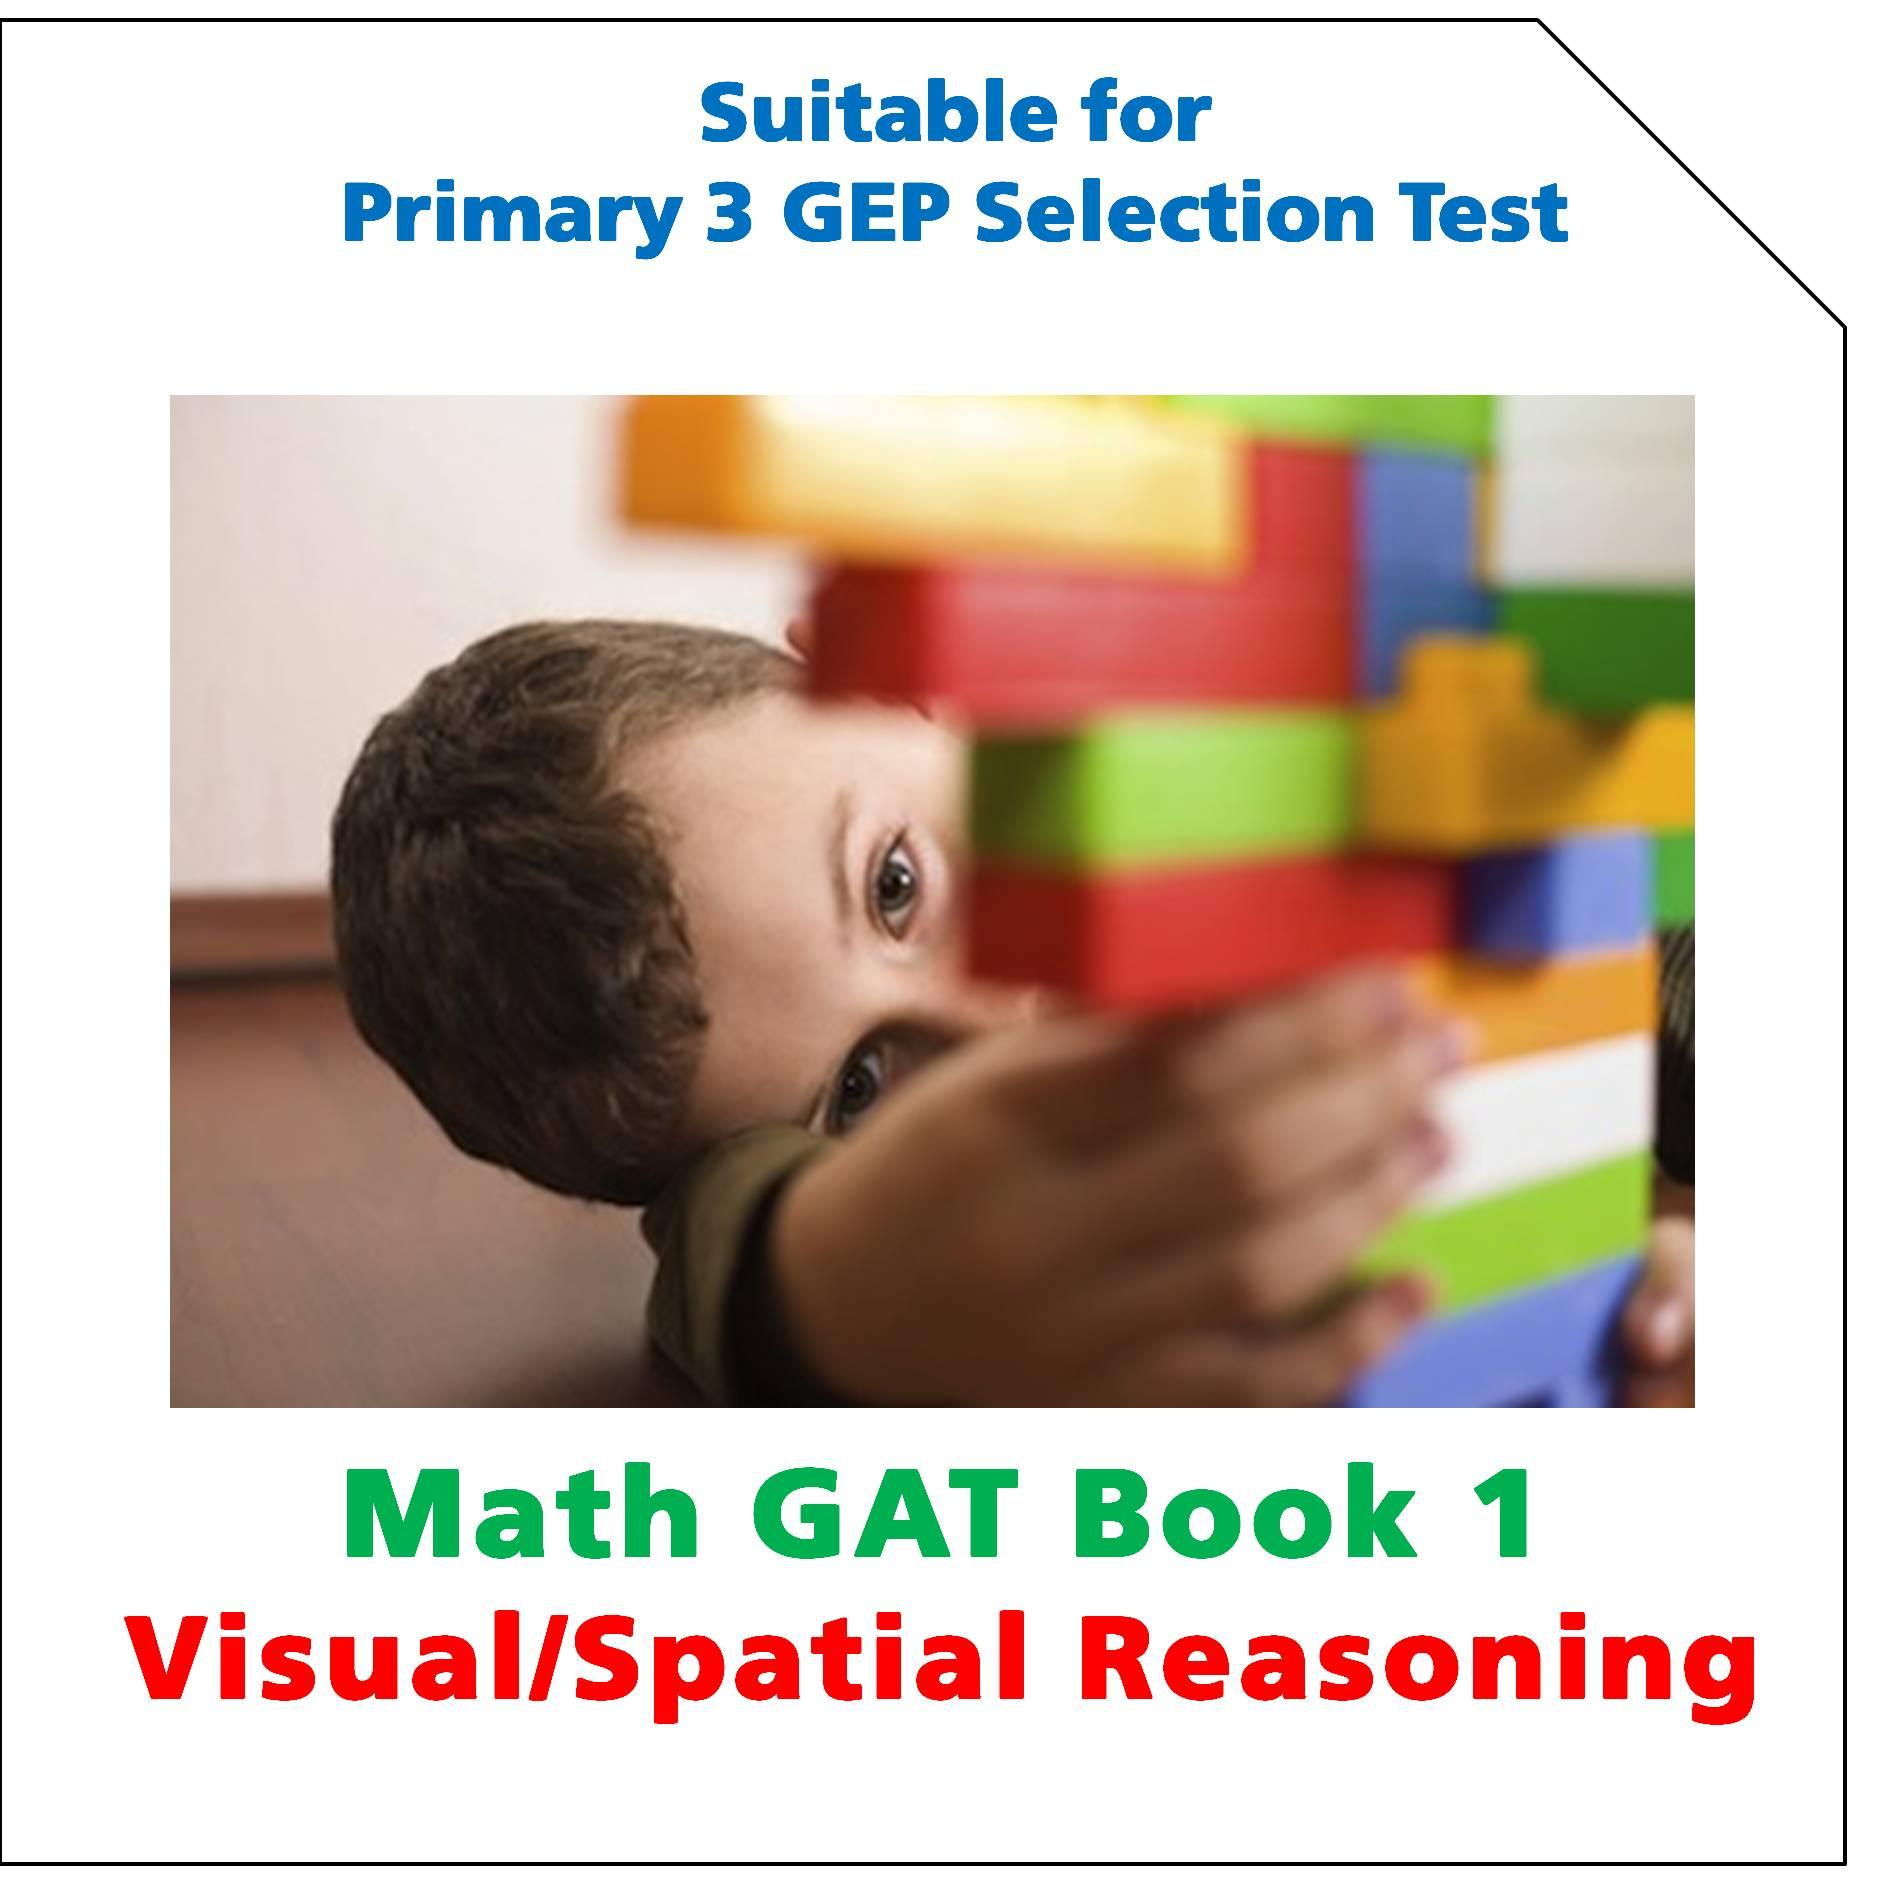 P3 Math Gat Book 1 Visual Spatial Reasoning Setquestions